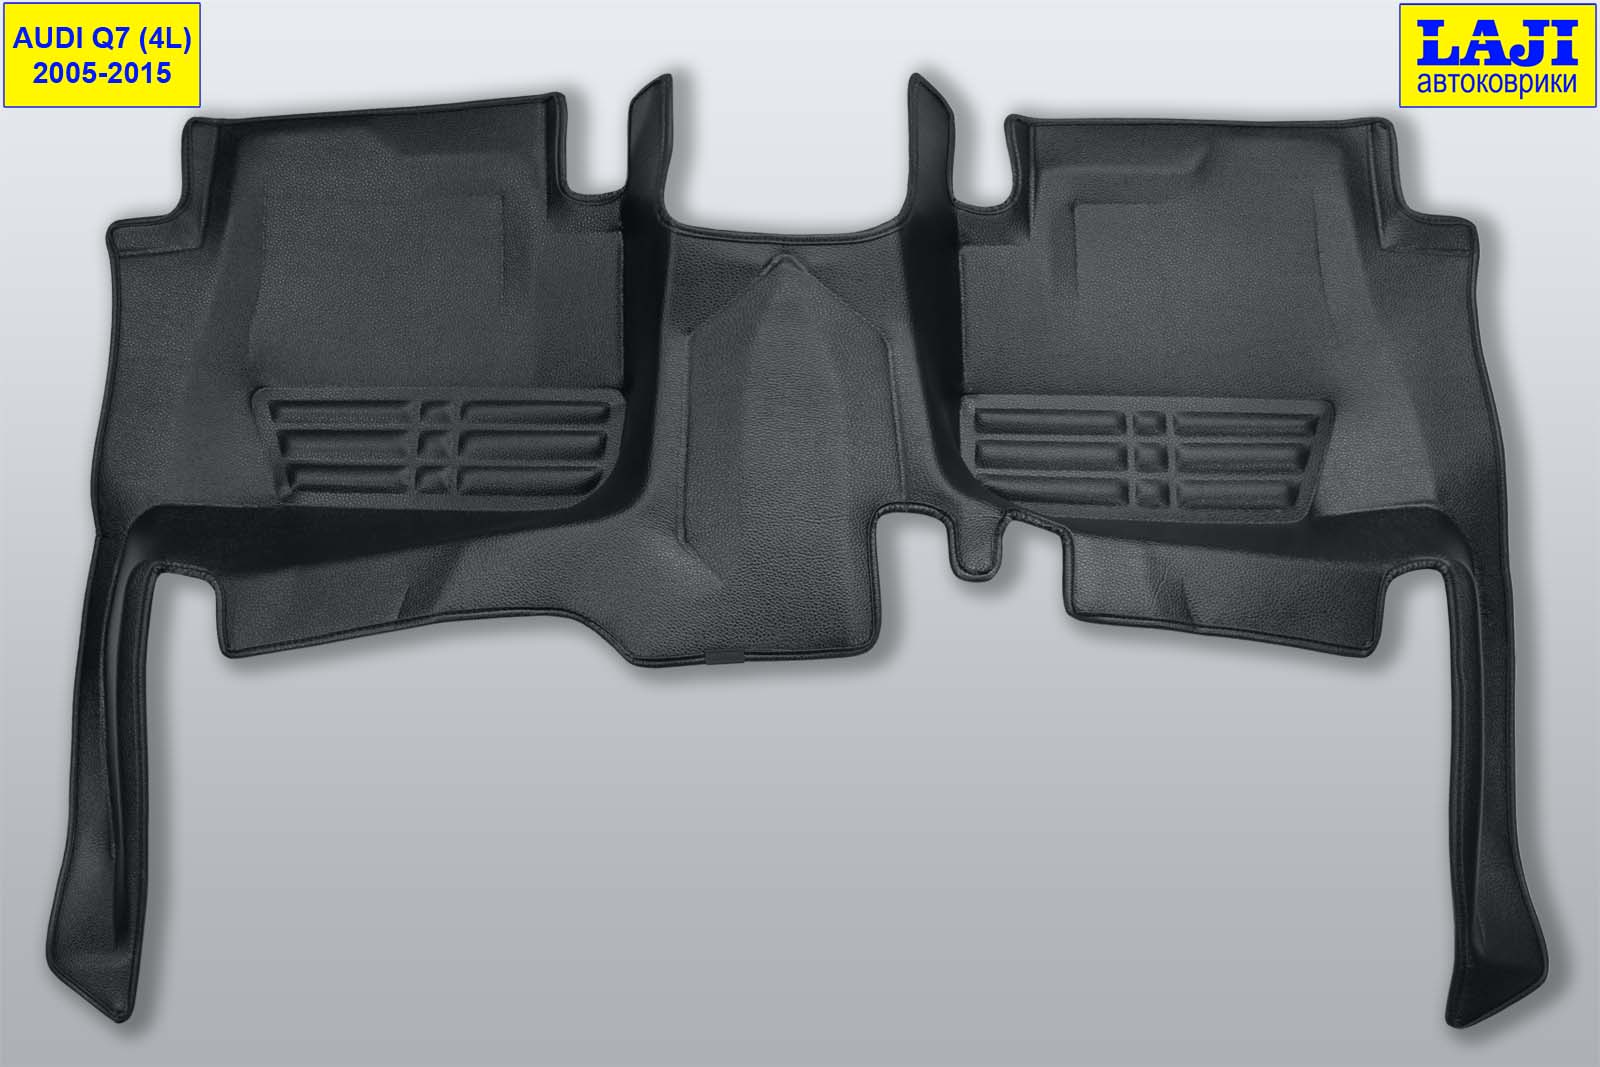 5D коврики для Audi Q7 4L 2005-2015 9